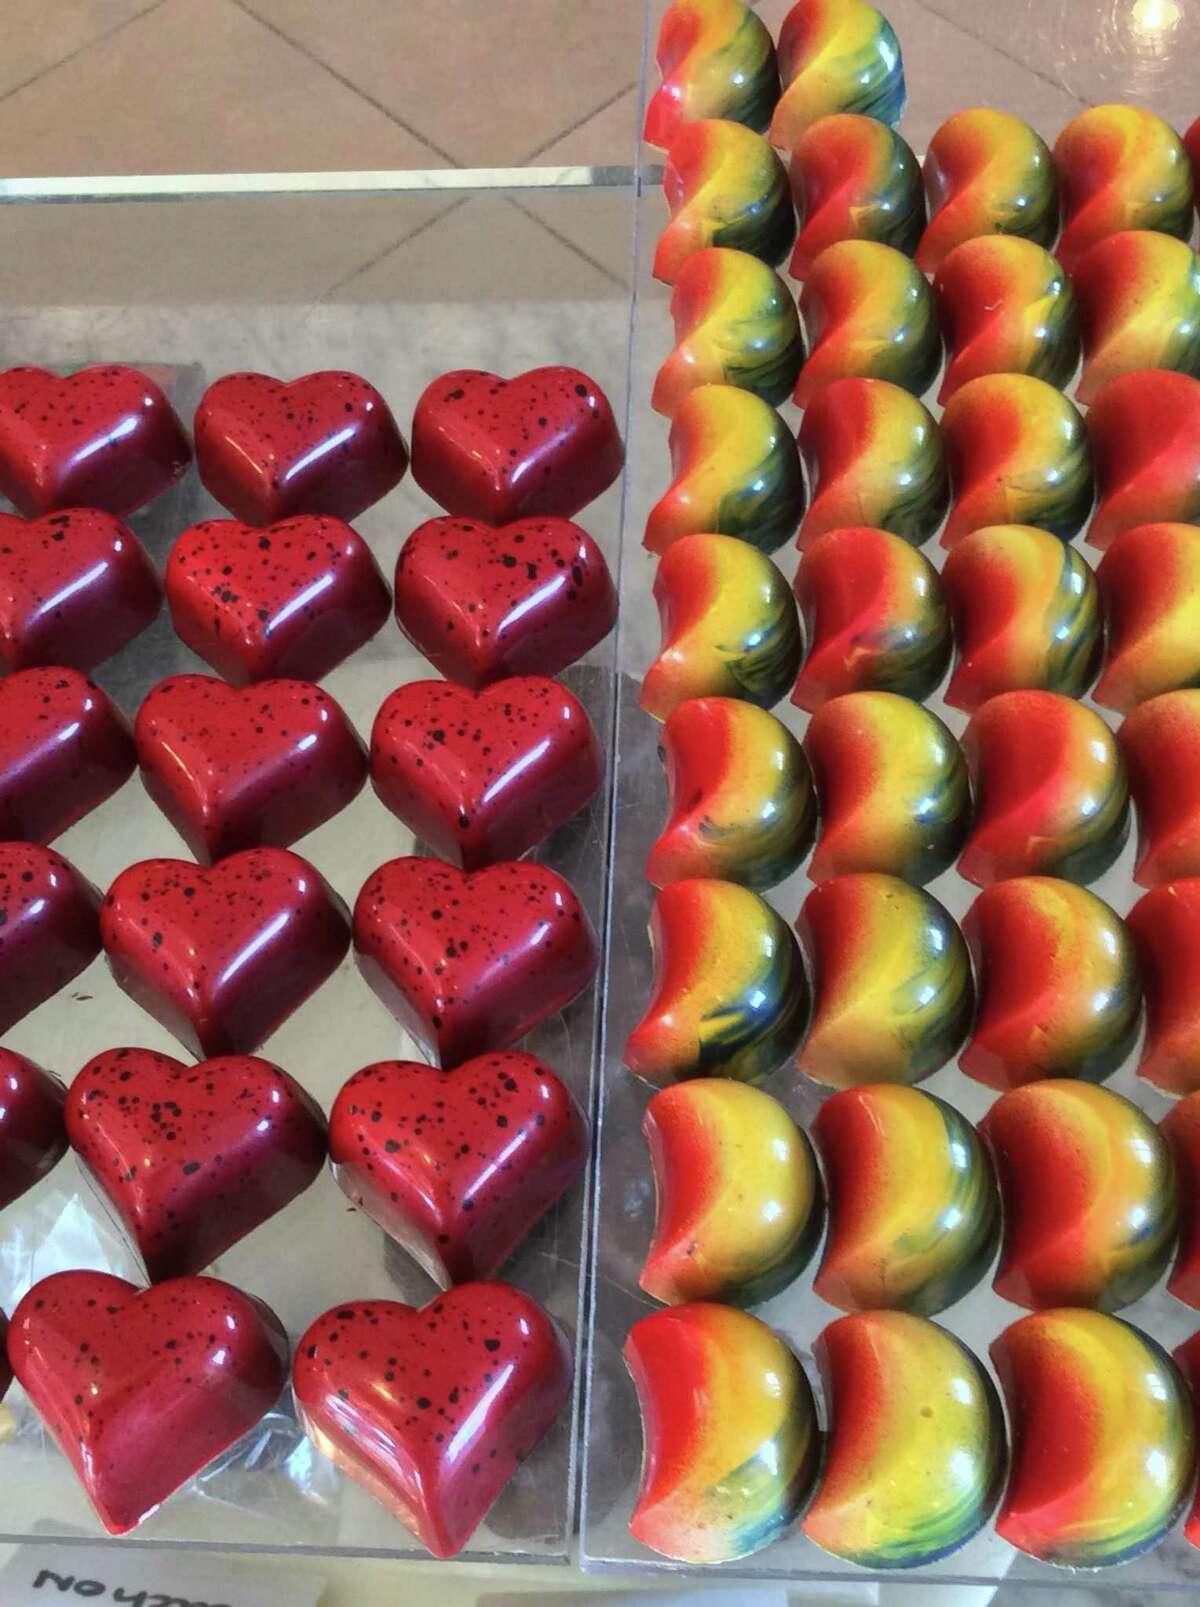 Chocolates are works of art at William Dean Chocolates.